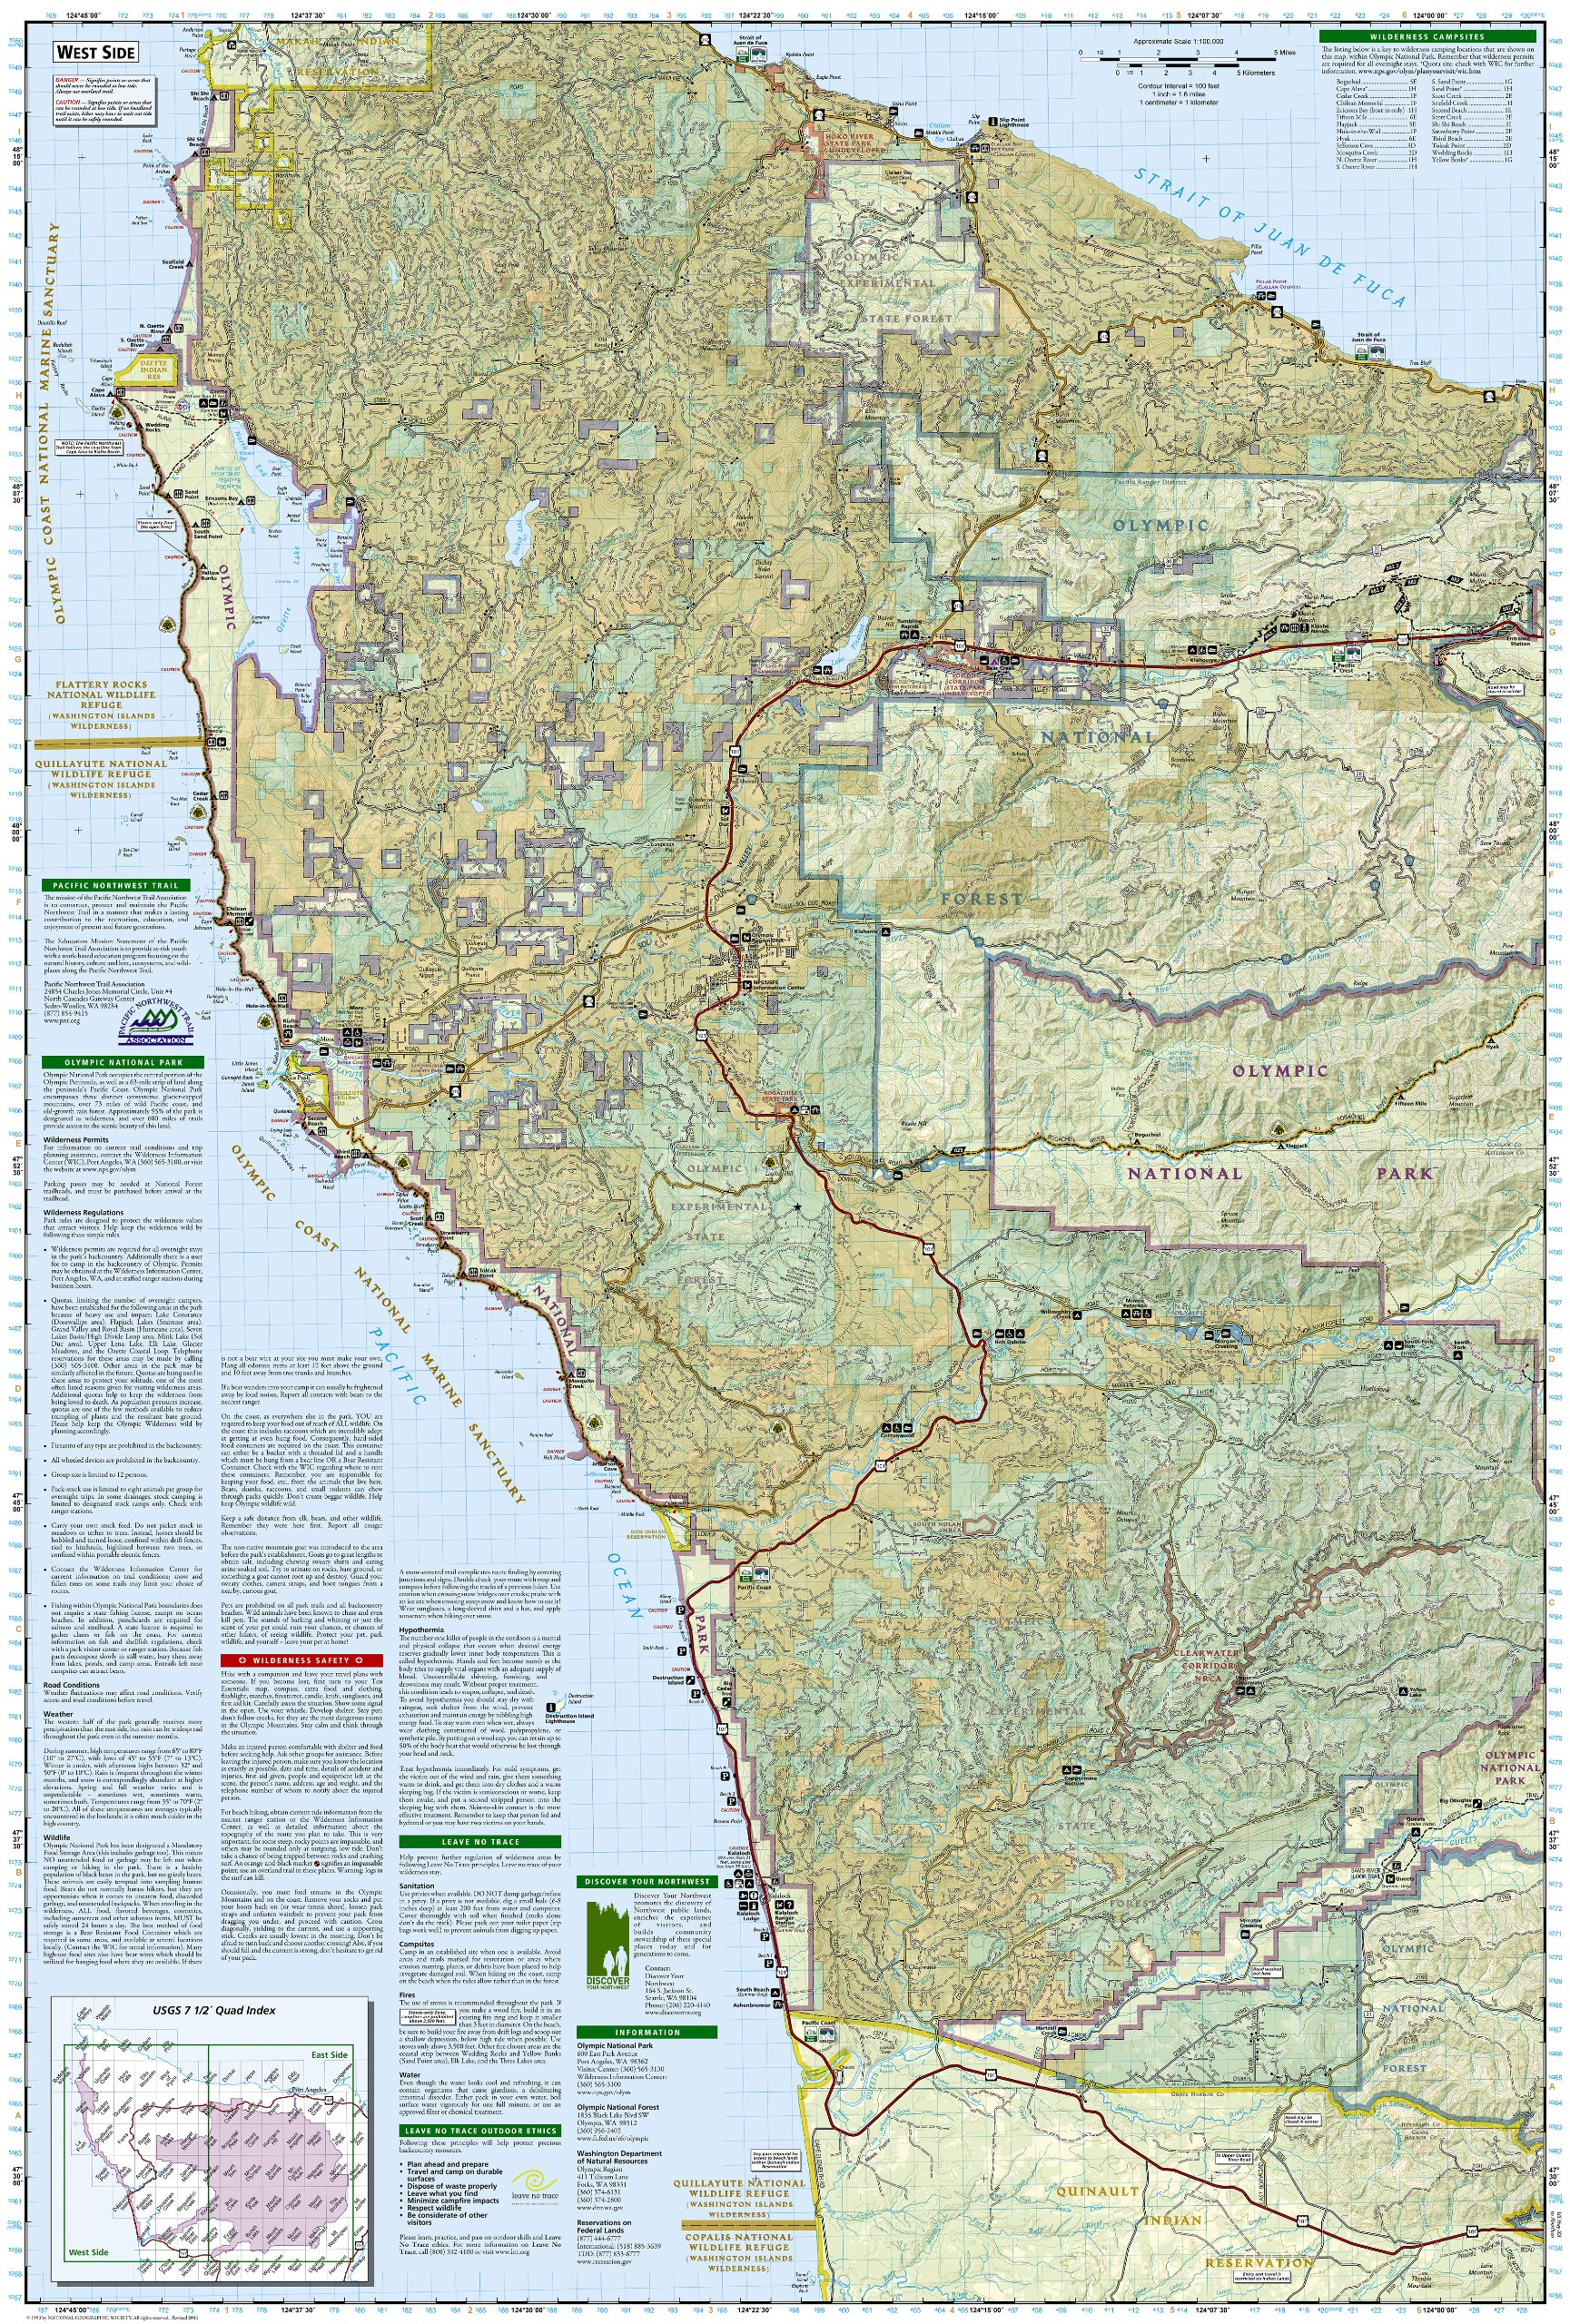 Olympic National Park National Geographic Trails Illustrated Map - Map washington state peninsula